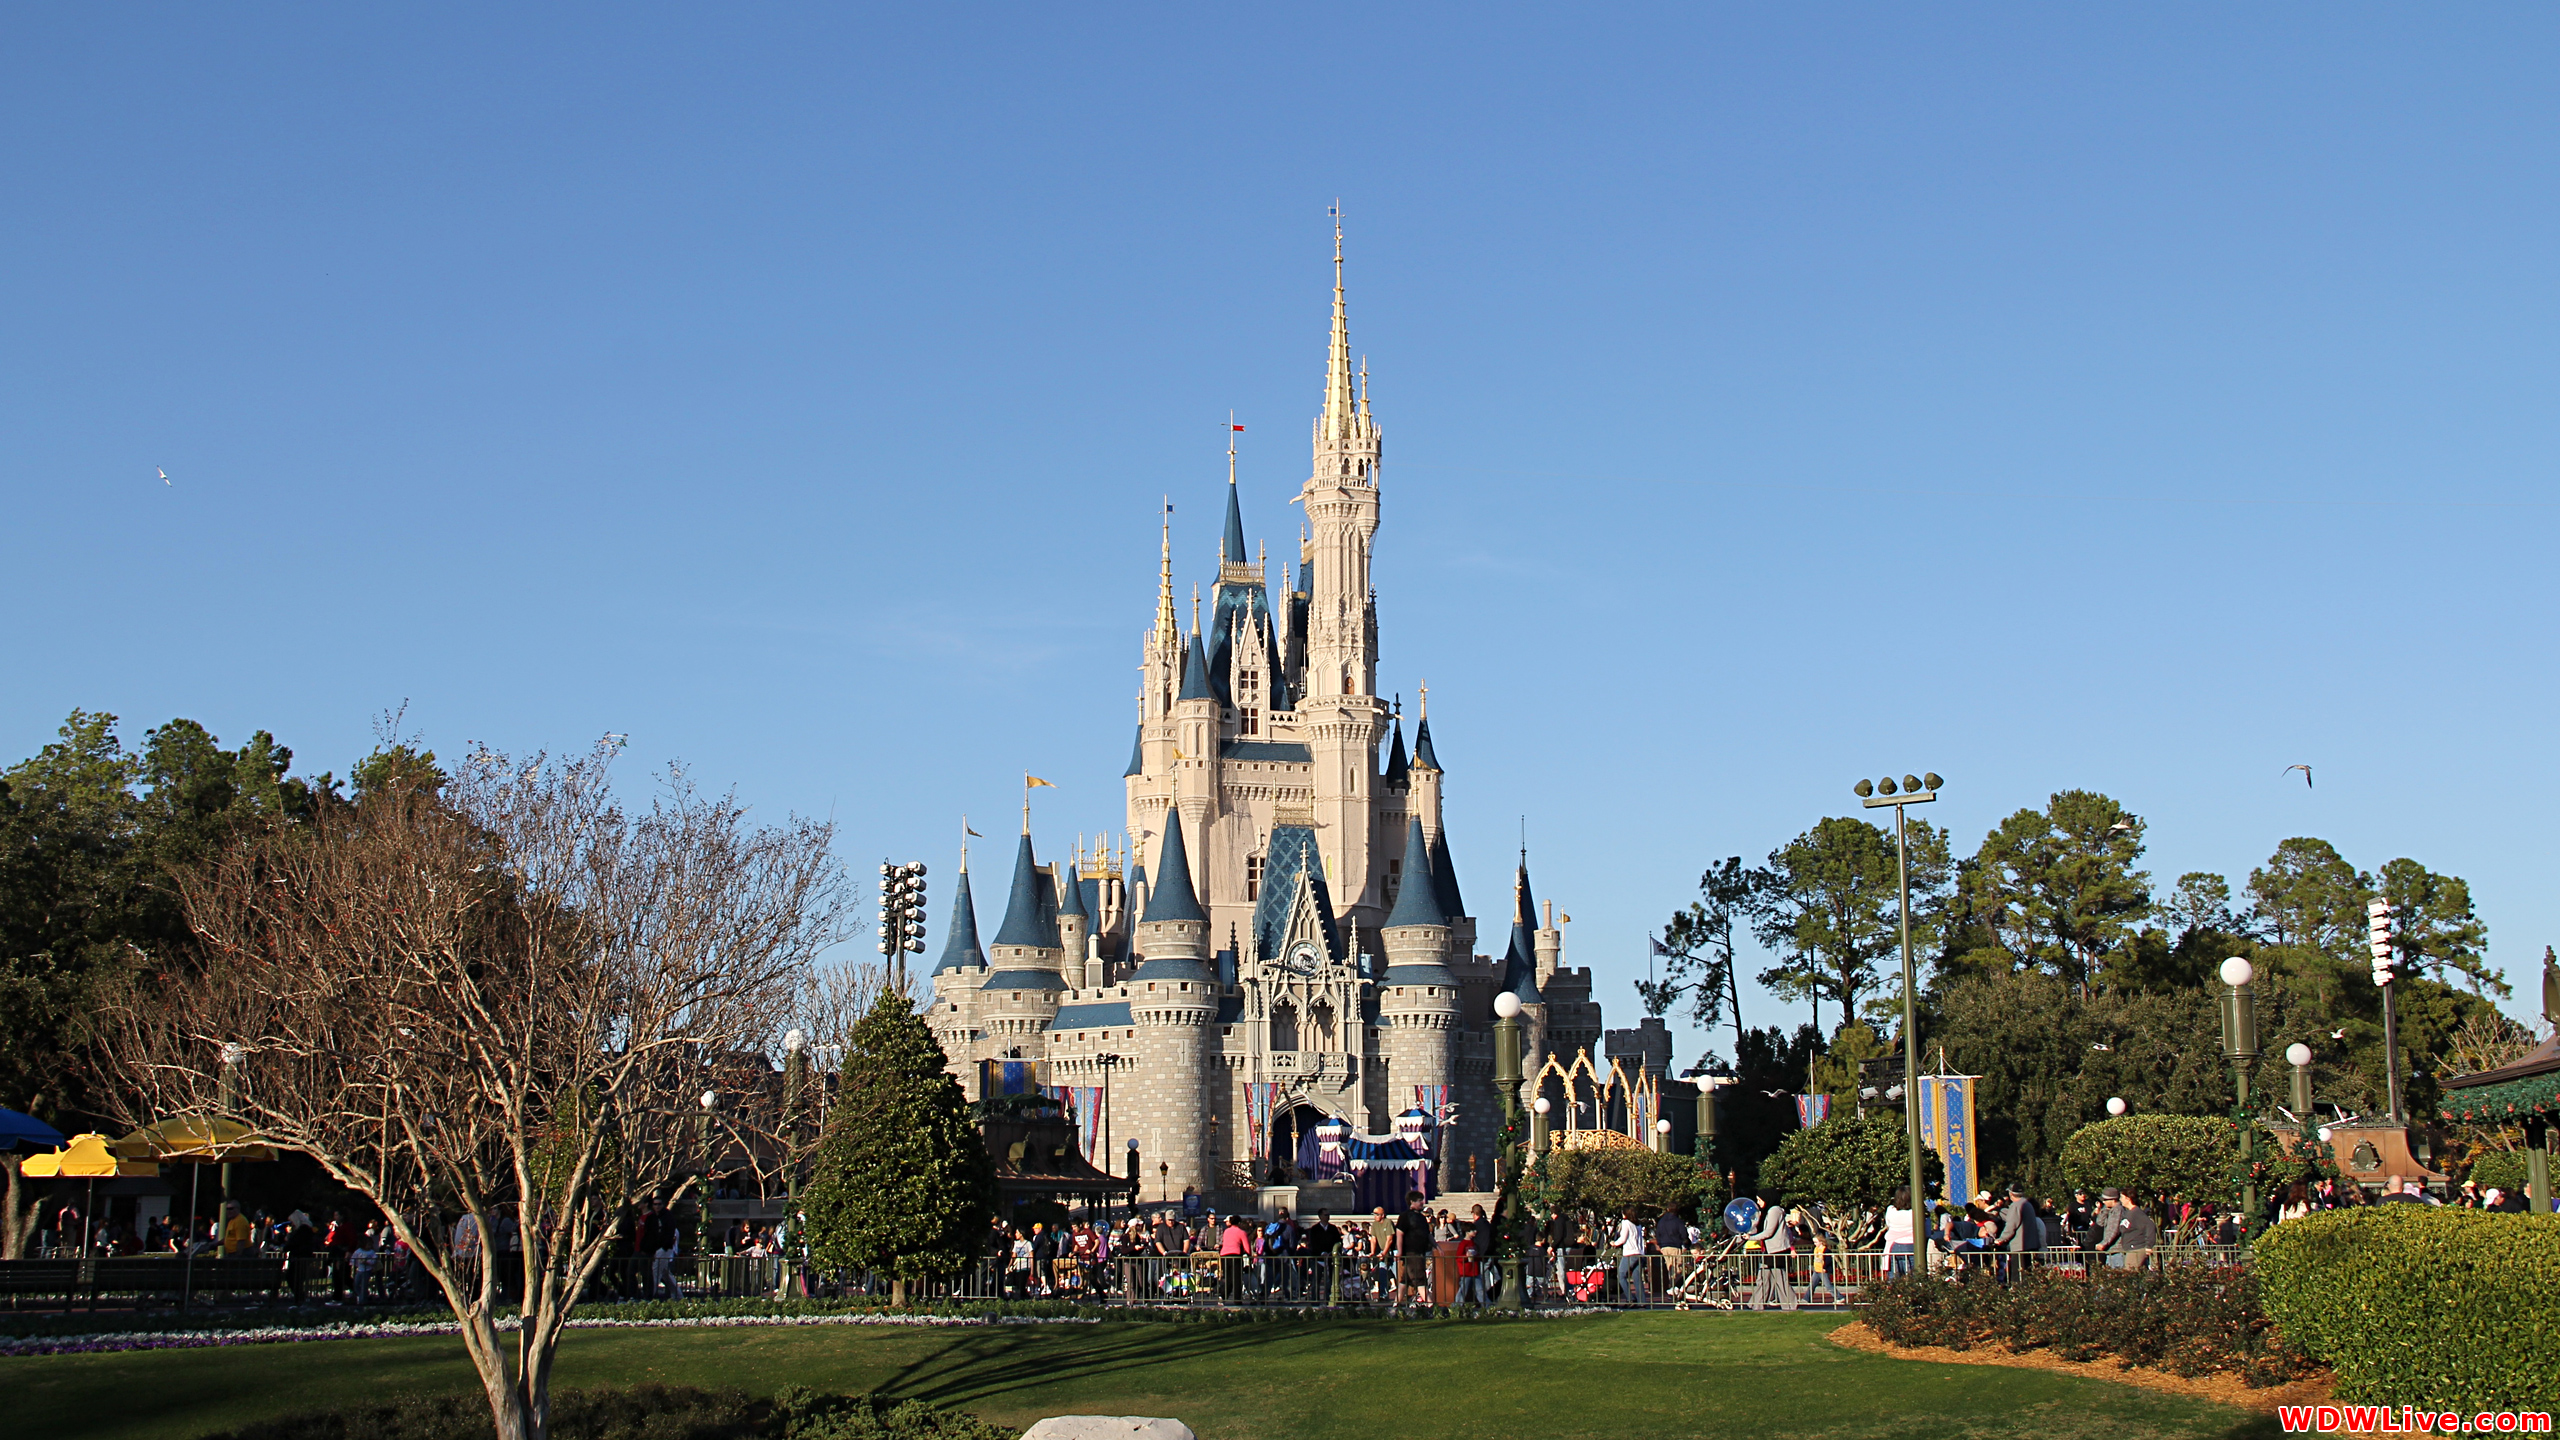 Cinderella Castle Desktop Wallpaper 2560x1440 2560x1440